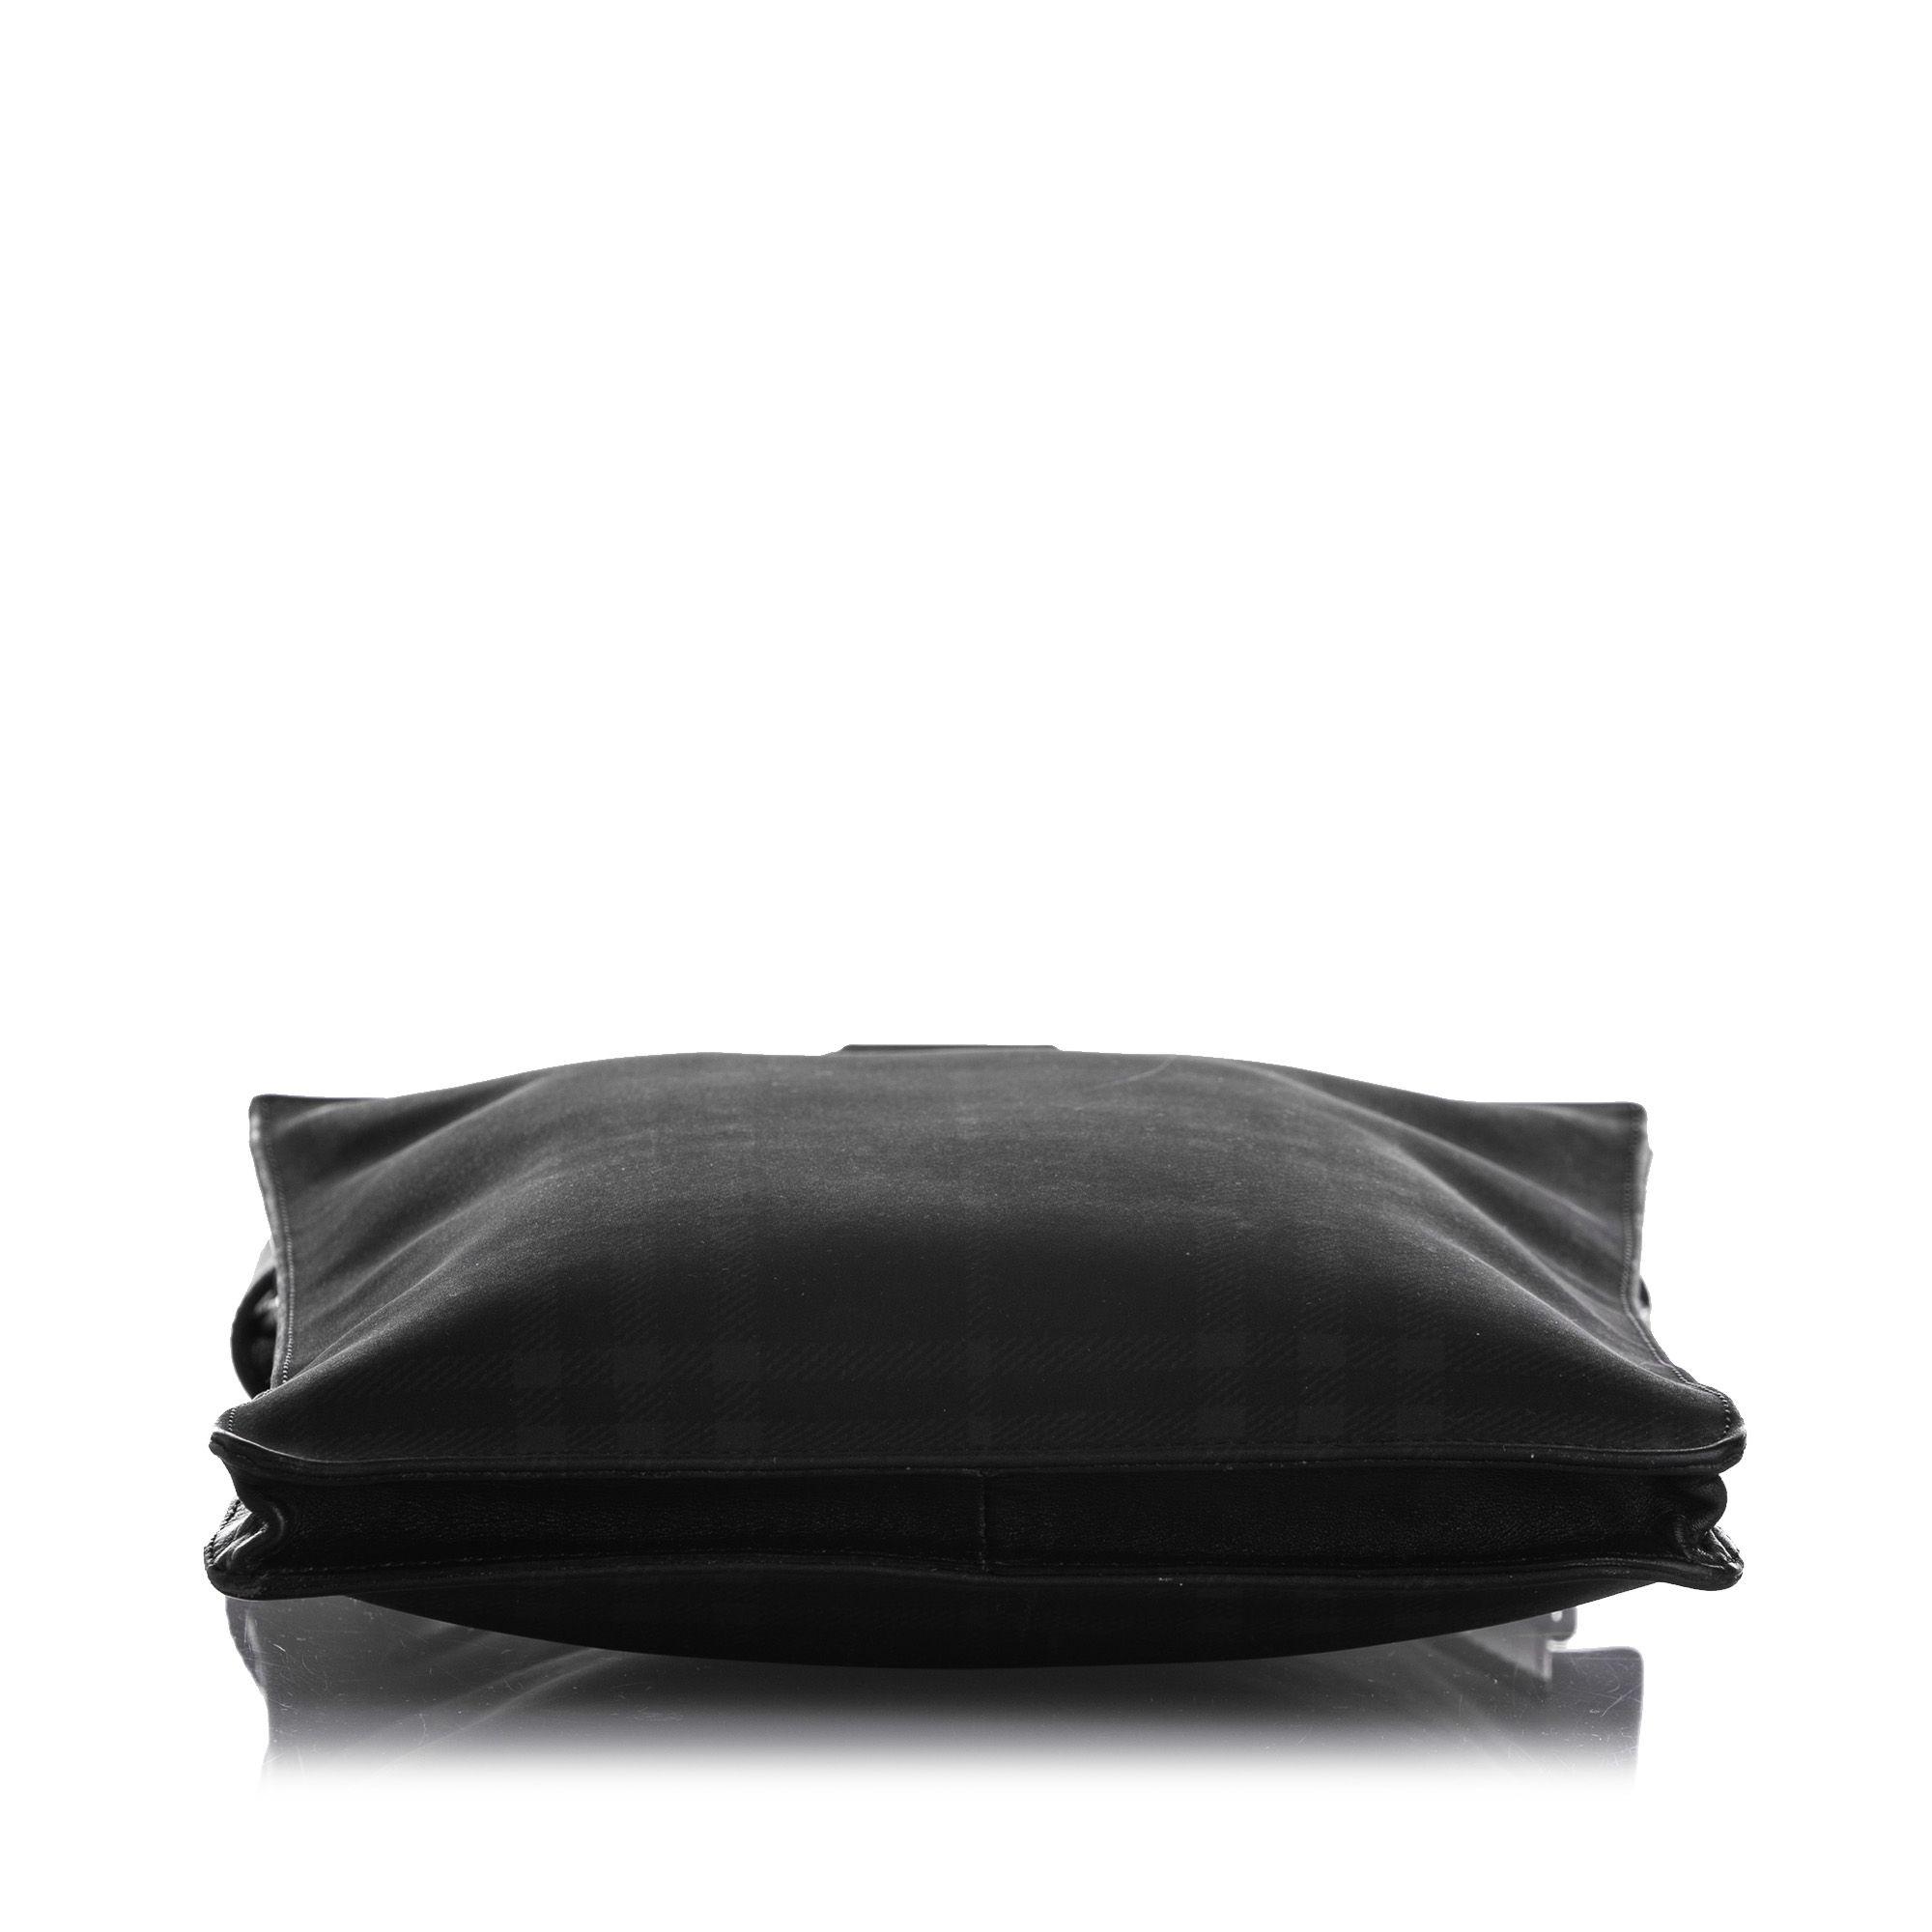 Vintage Burberry Plaid Leather Crossbody Bag Black